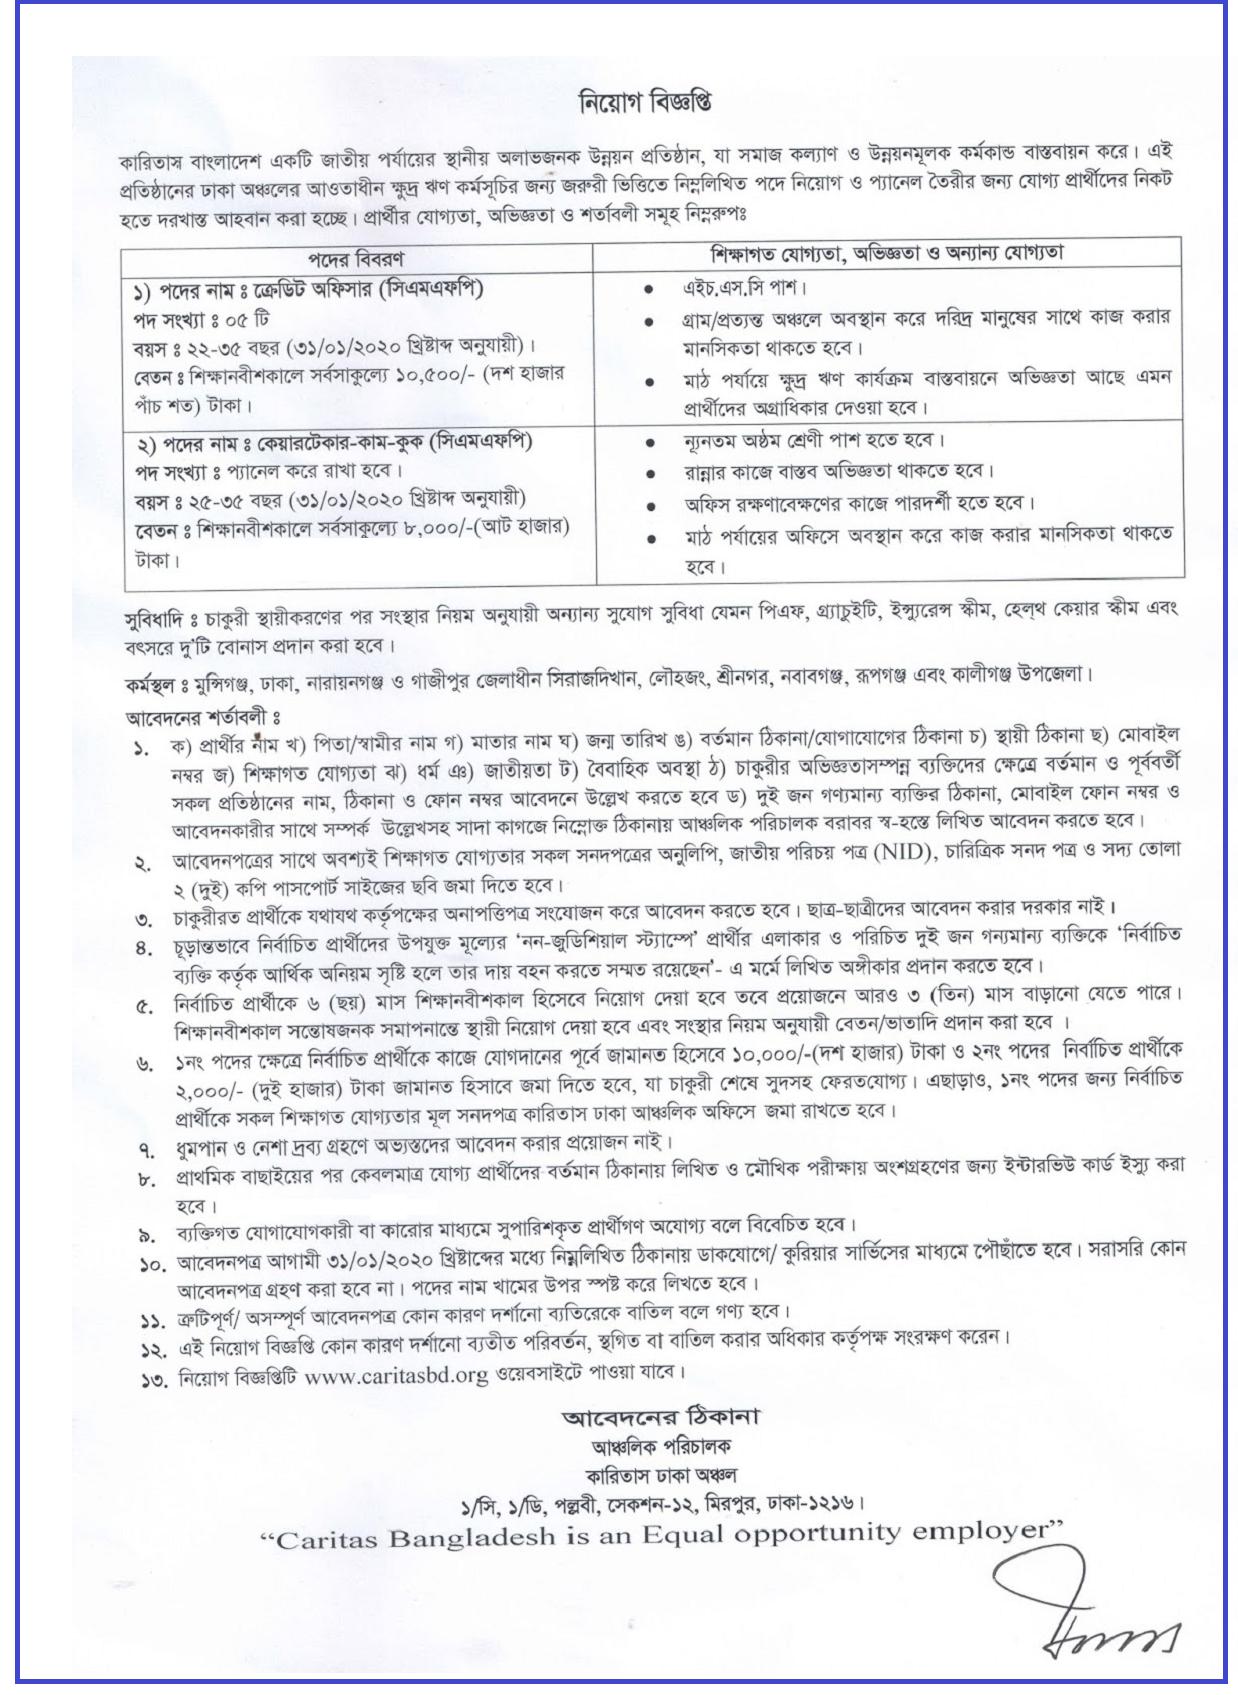 Caritas Bangladesh Job Circular 2020